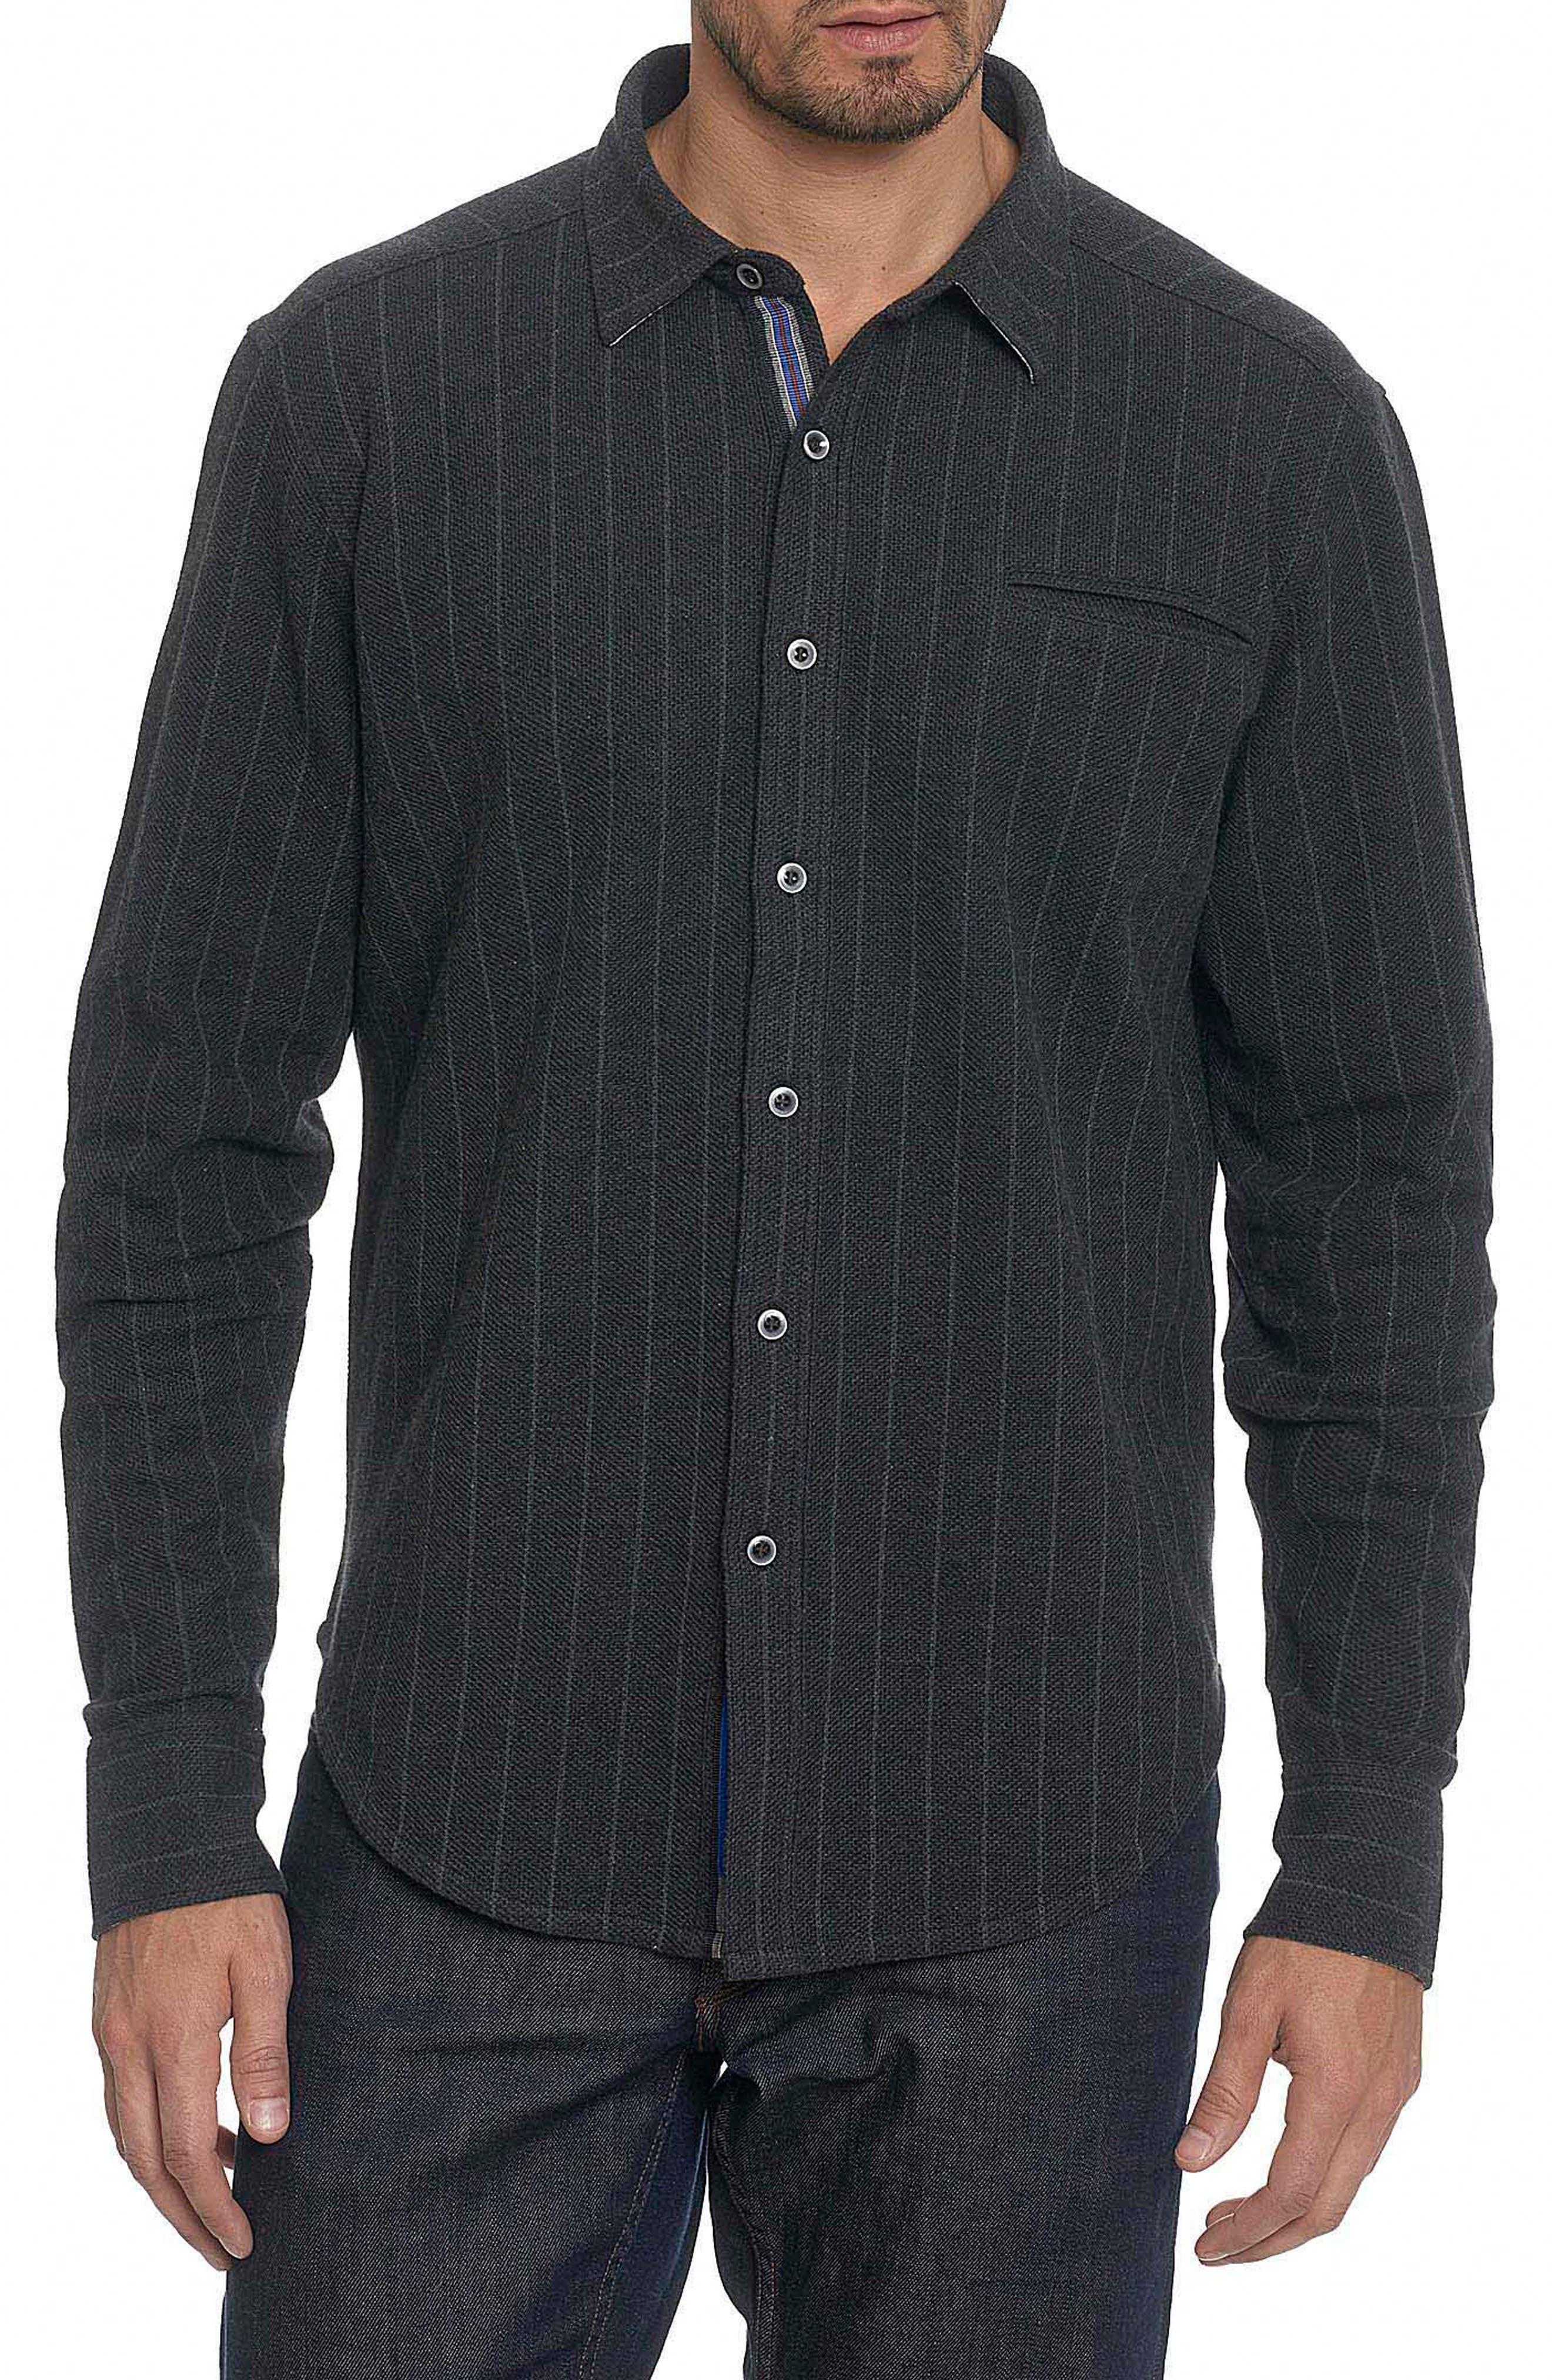 Alternate Image 1 Selected - Robert Graham Amboy Classic Fit Shirt Jacket